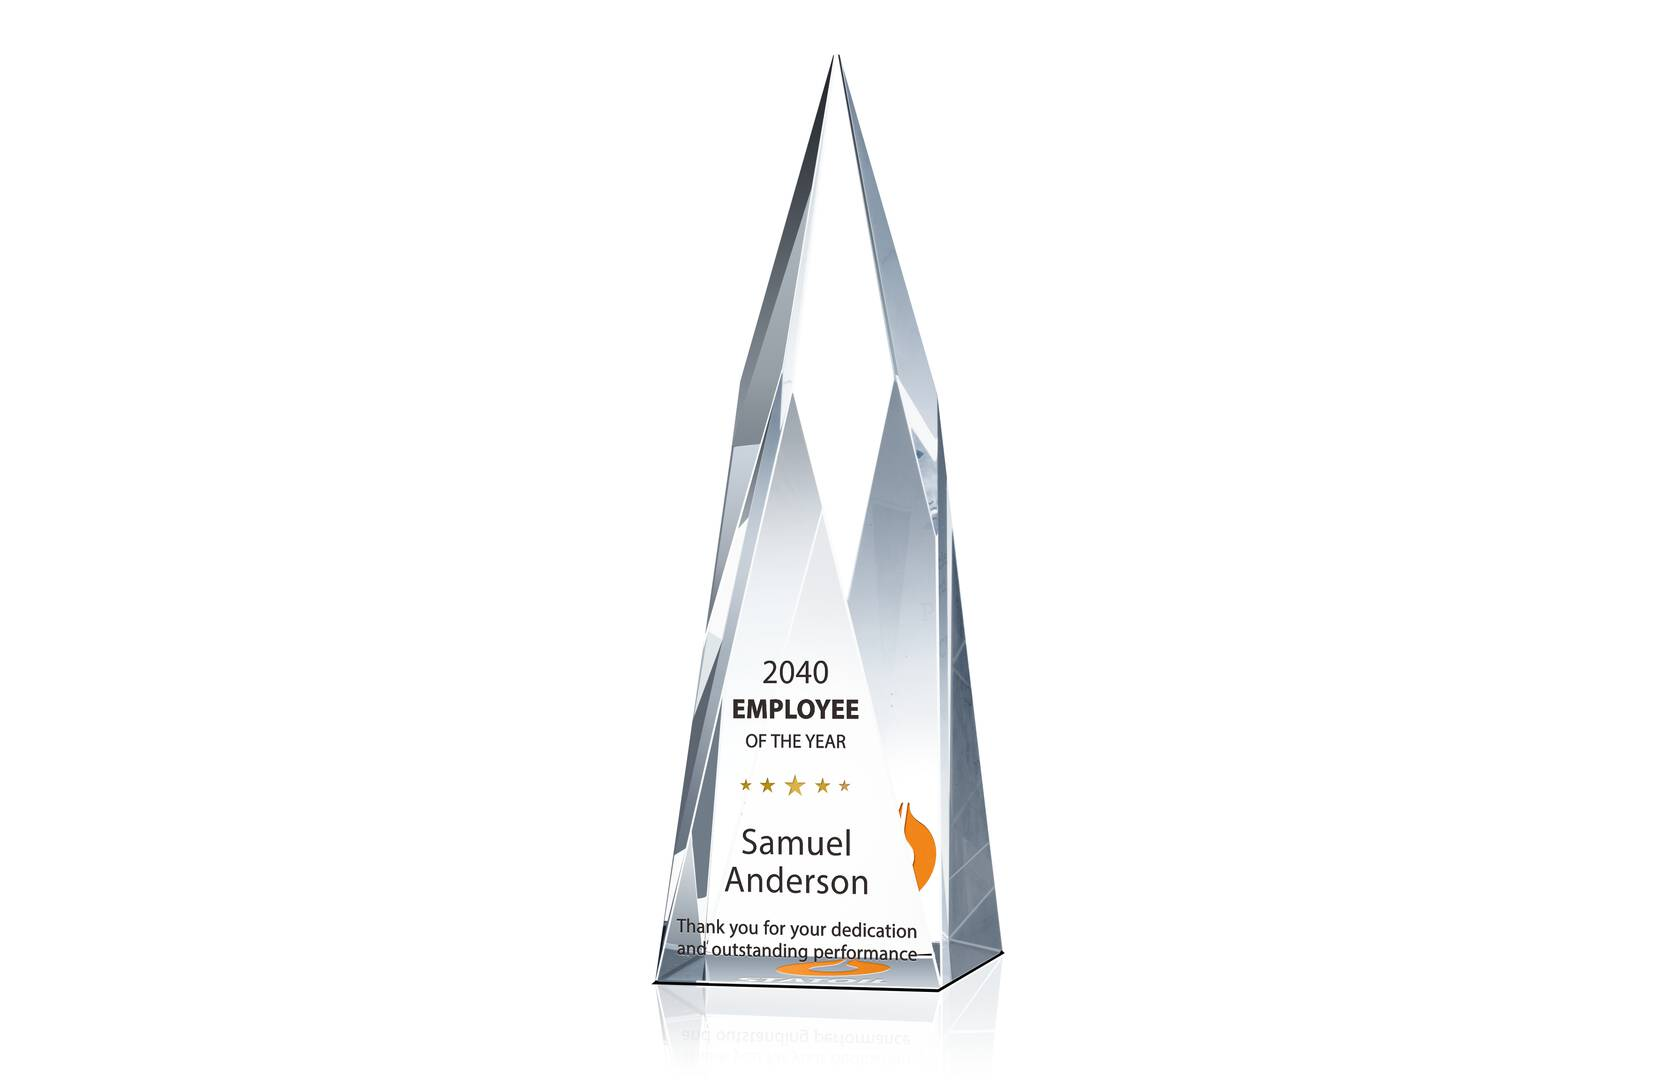 Summit Employee of the Year Award